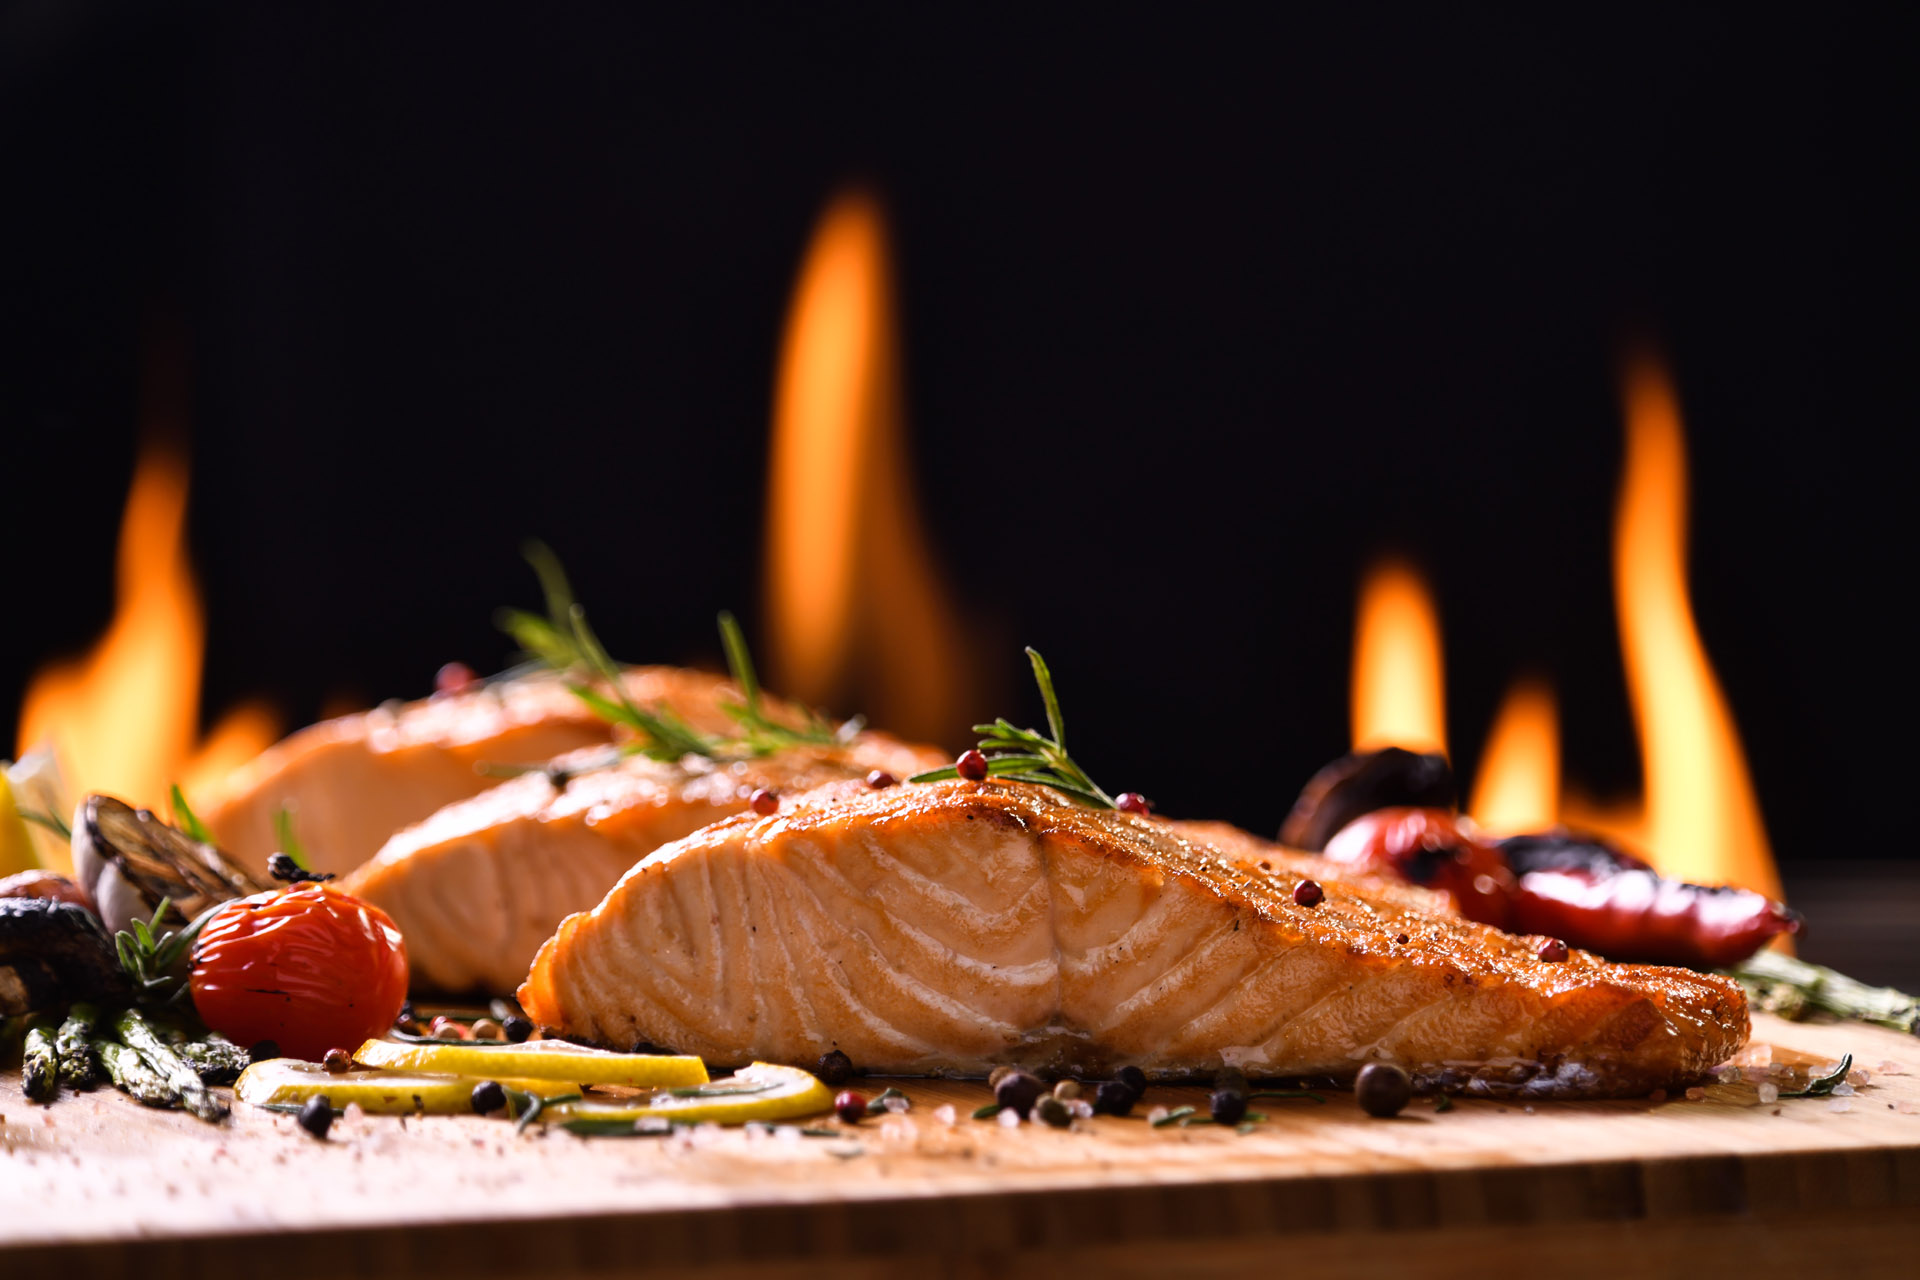 Barbecue - Palethoeve